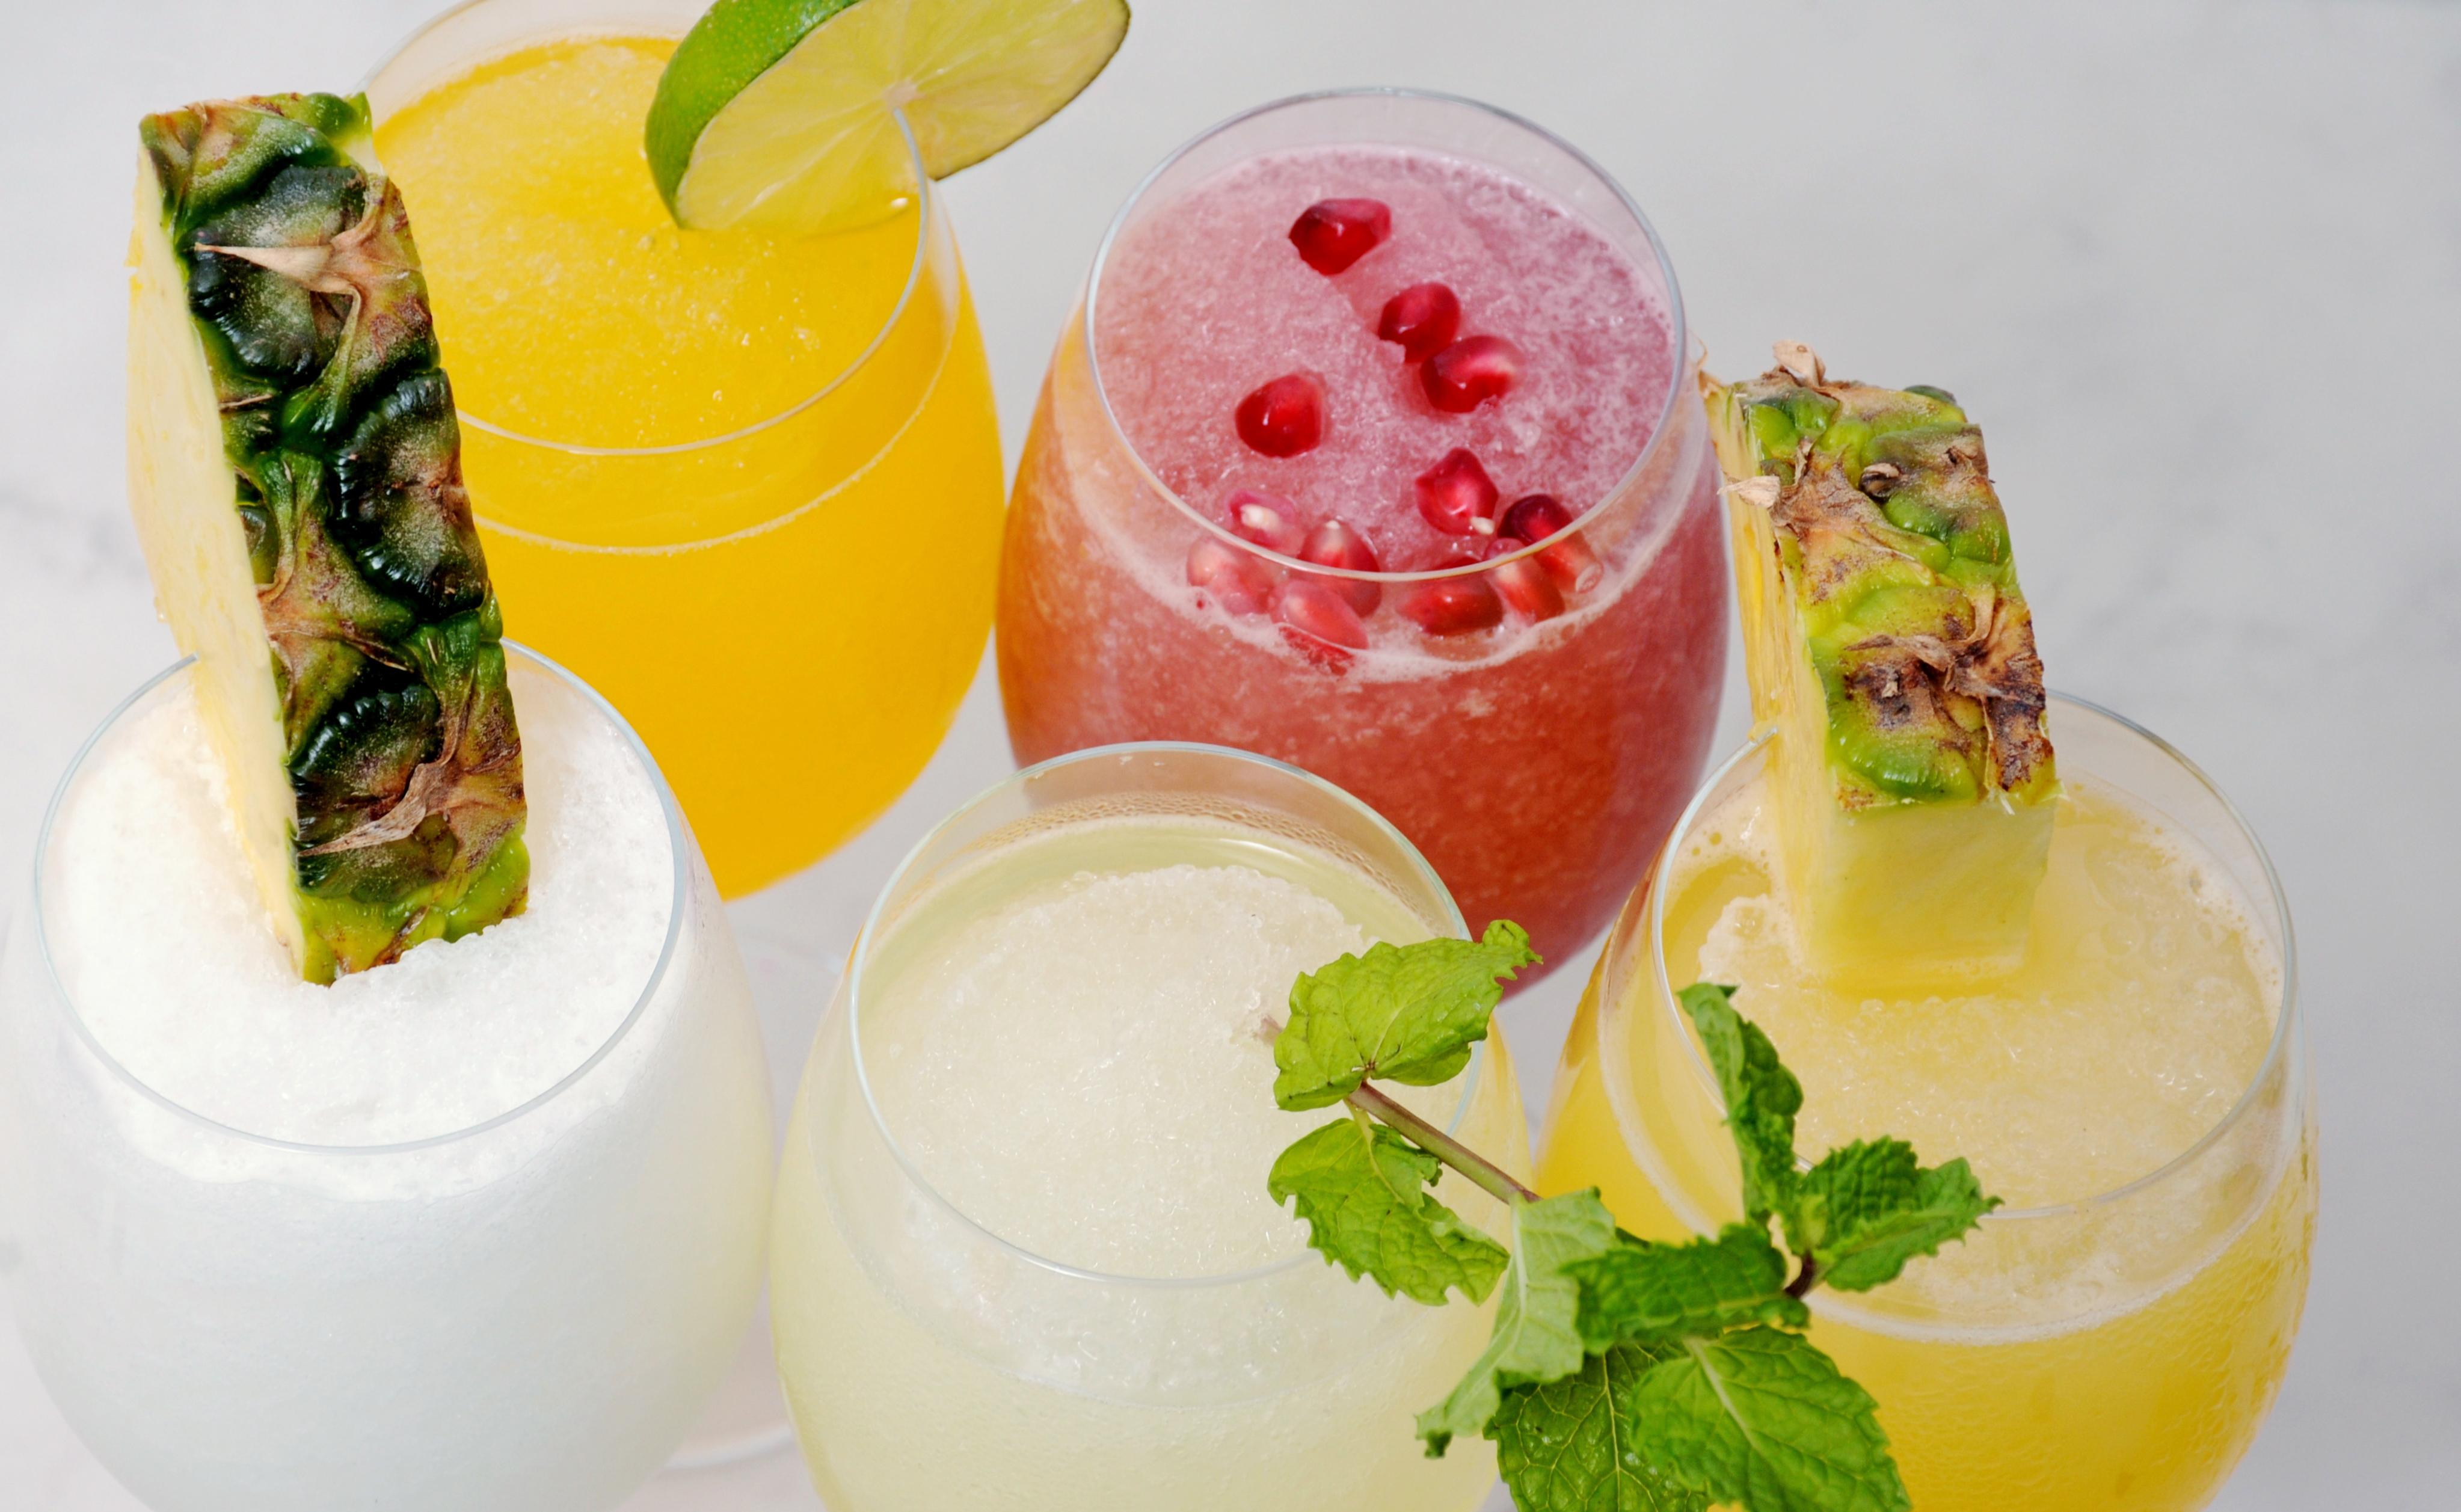 Peach Mango Bellini, Pina Colada, Mojito, Mai Tai, Watermelon Wine Slushies